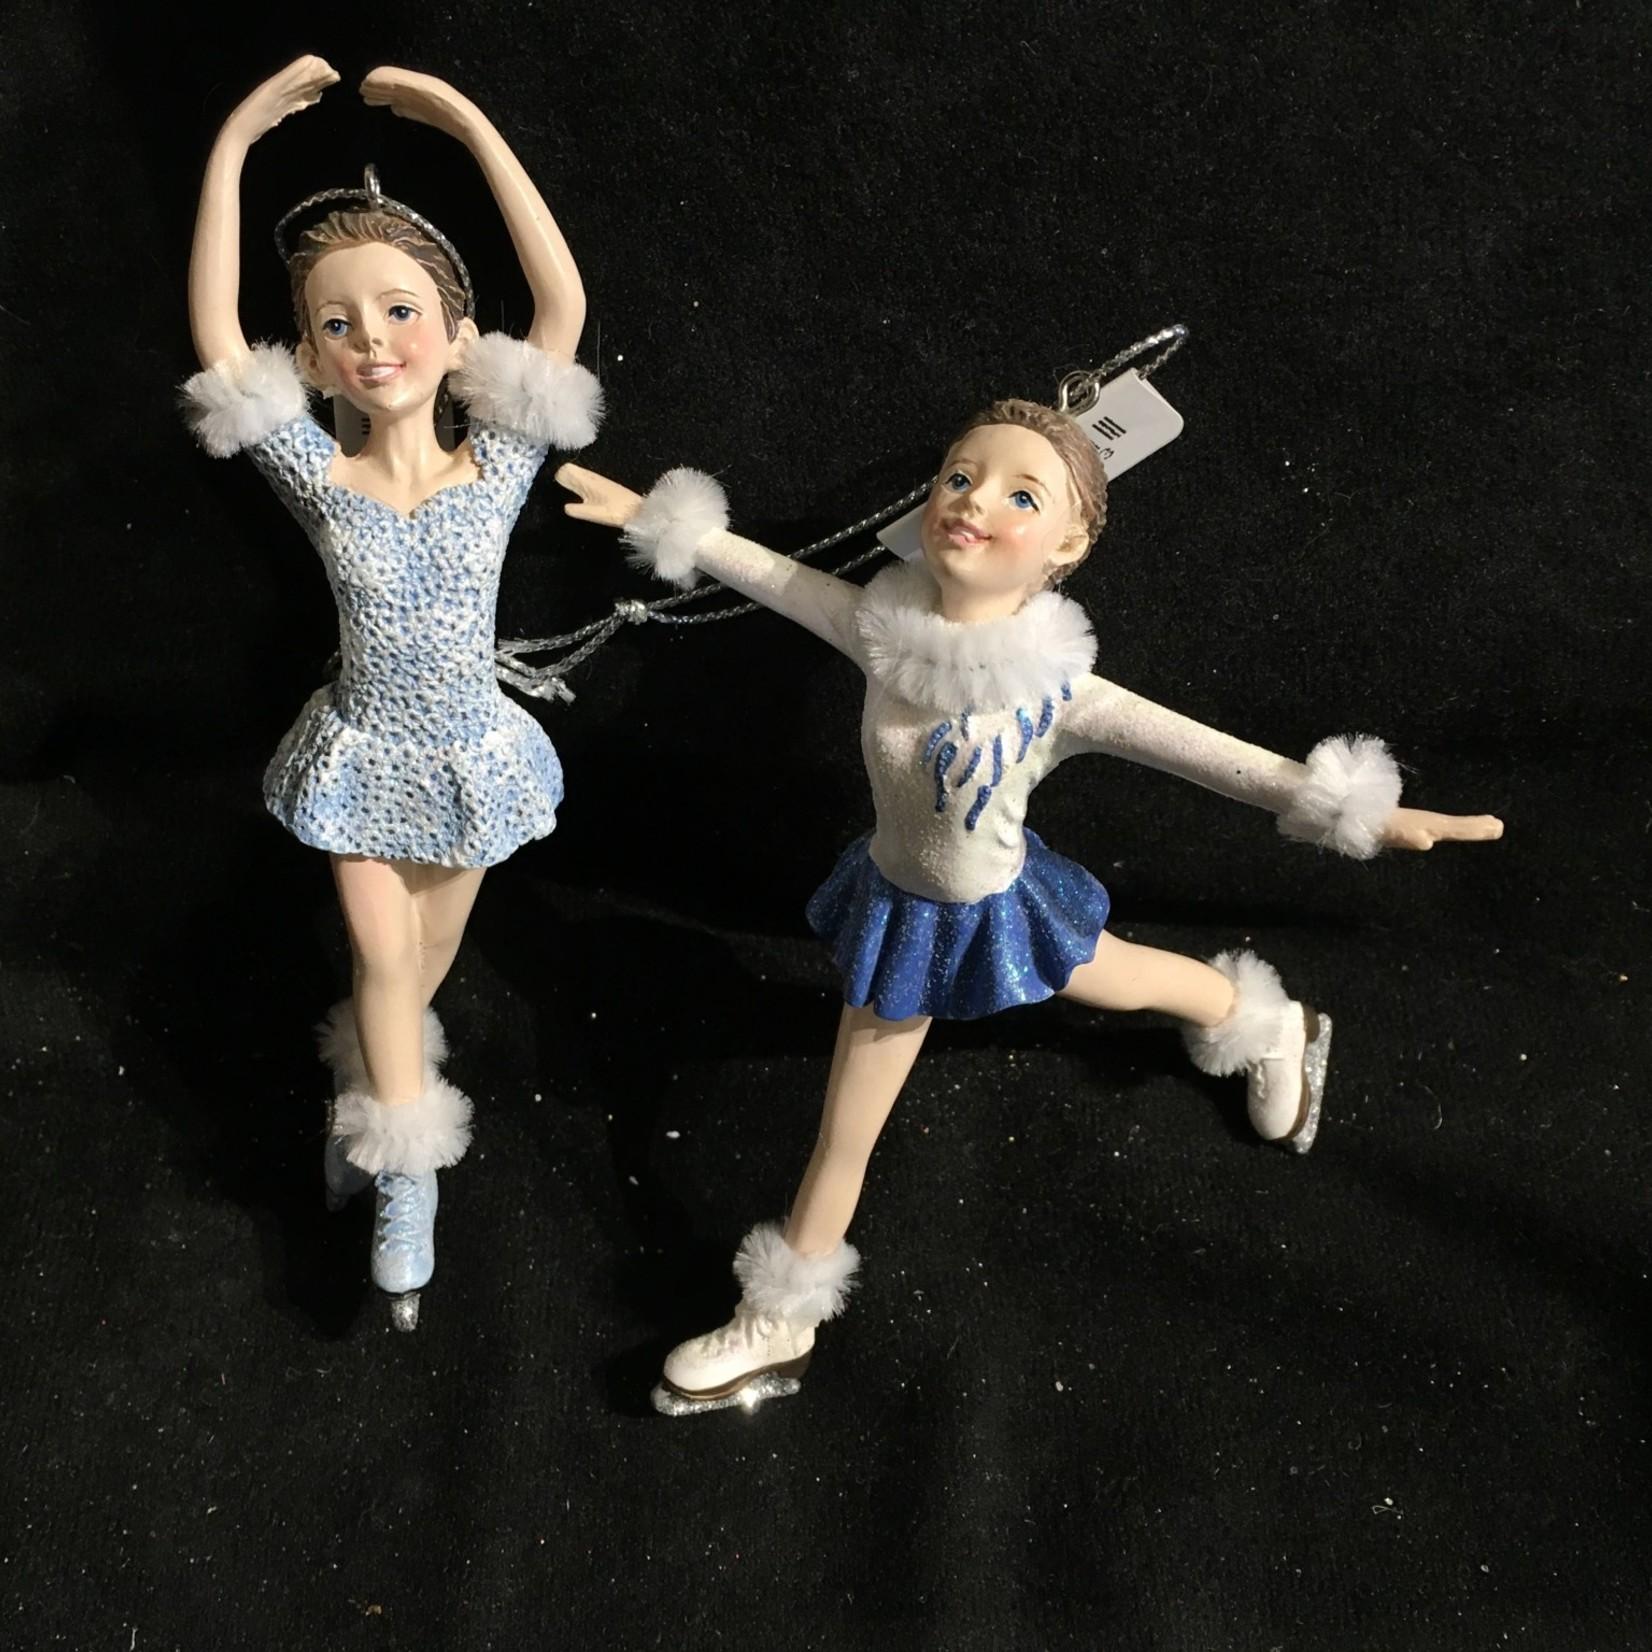 Ice Dancer 2A